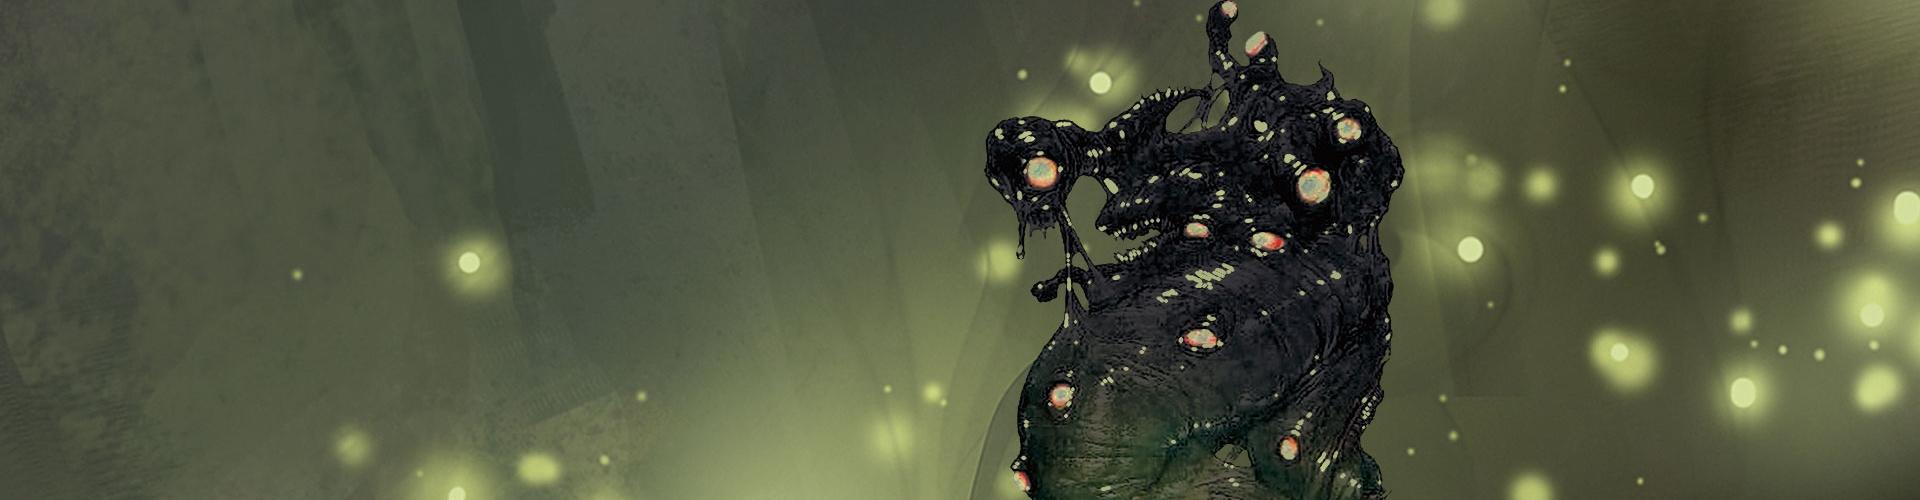 Juiblex: The Faceless Lord